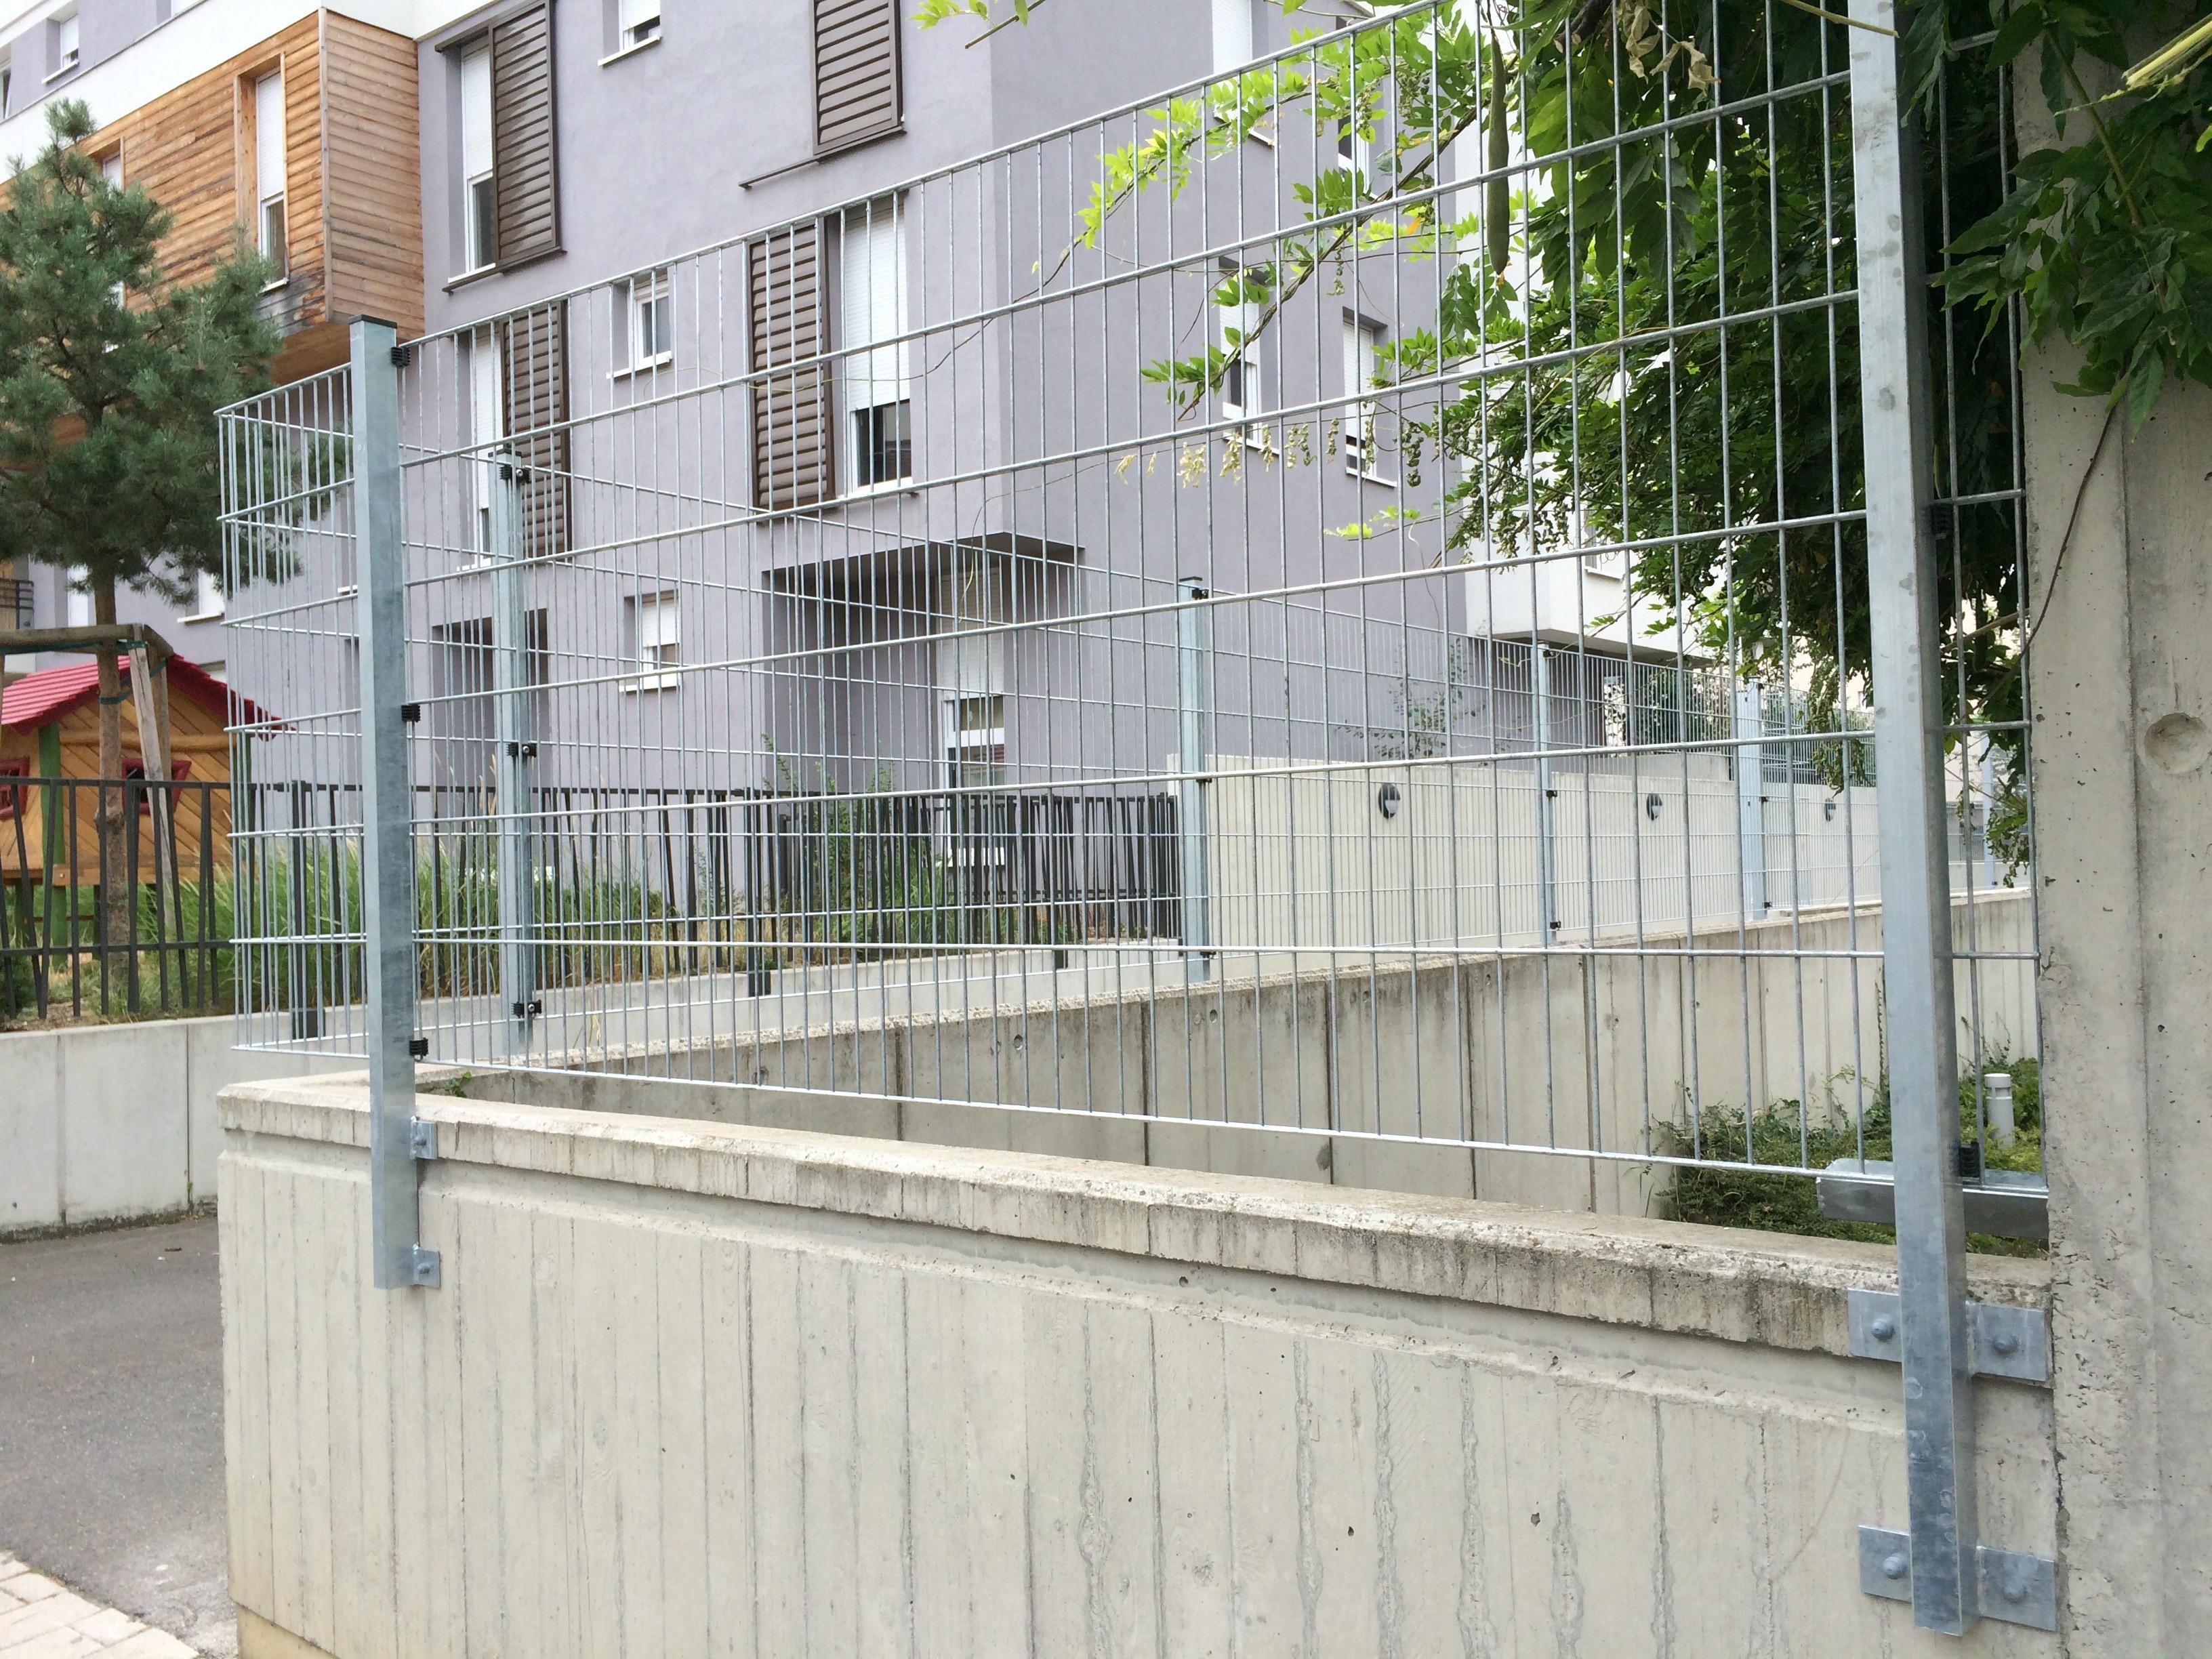 Métallerie - Sécurisation de site